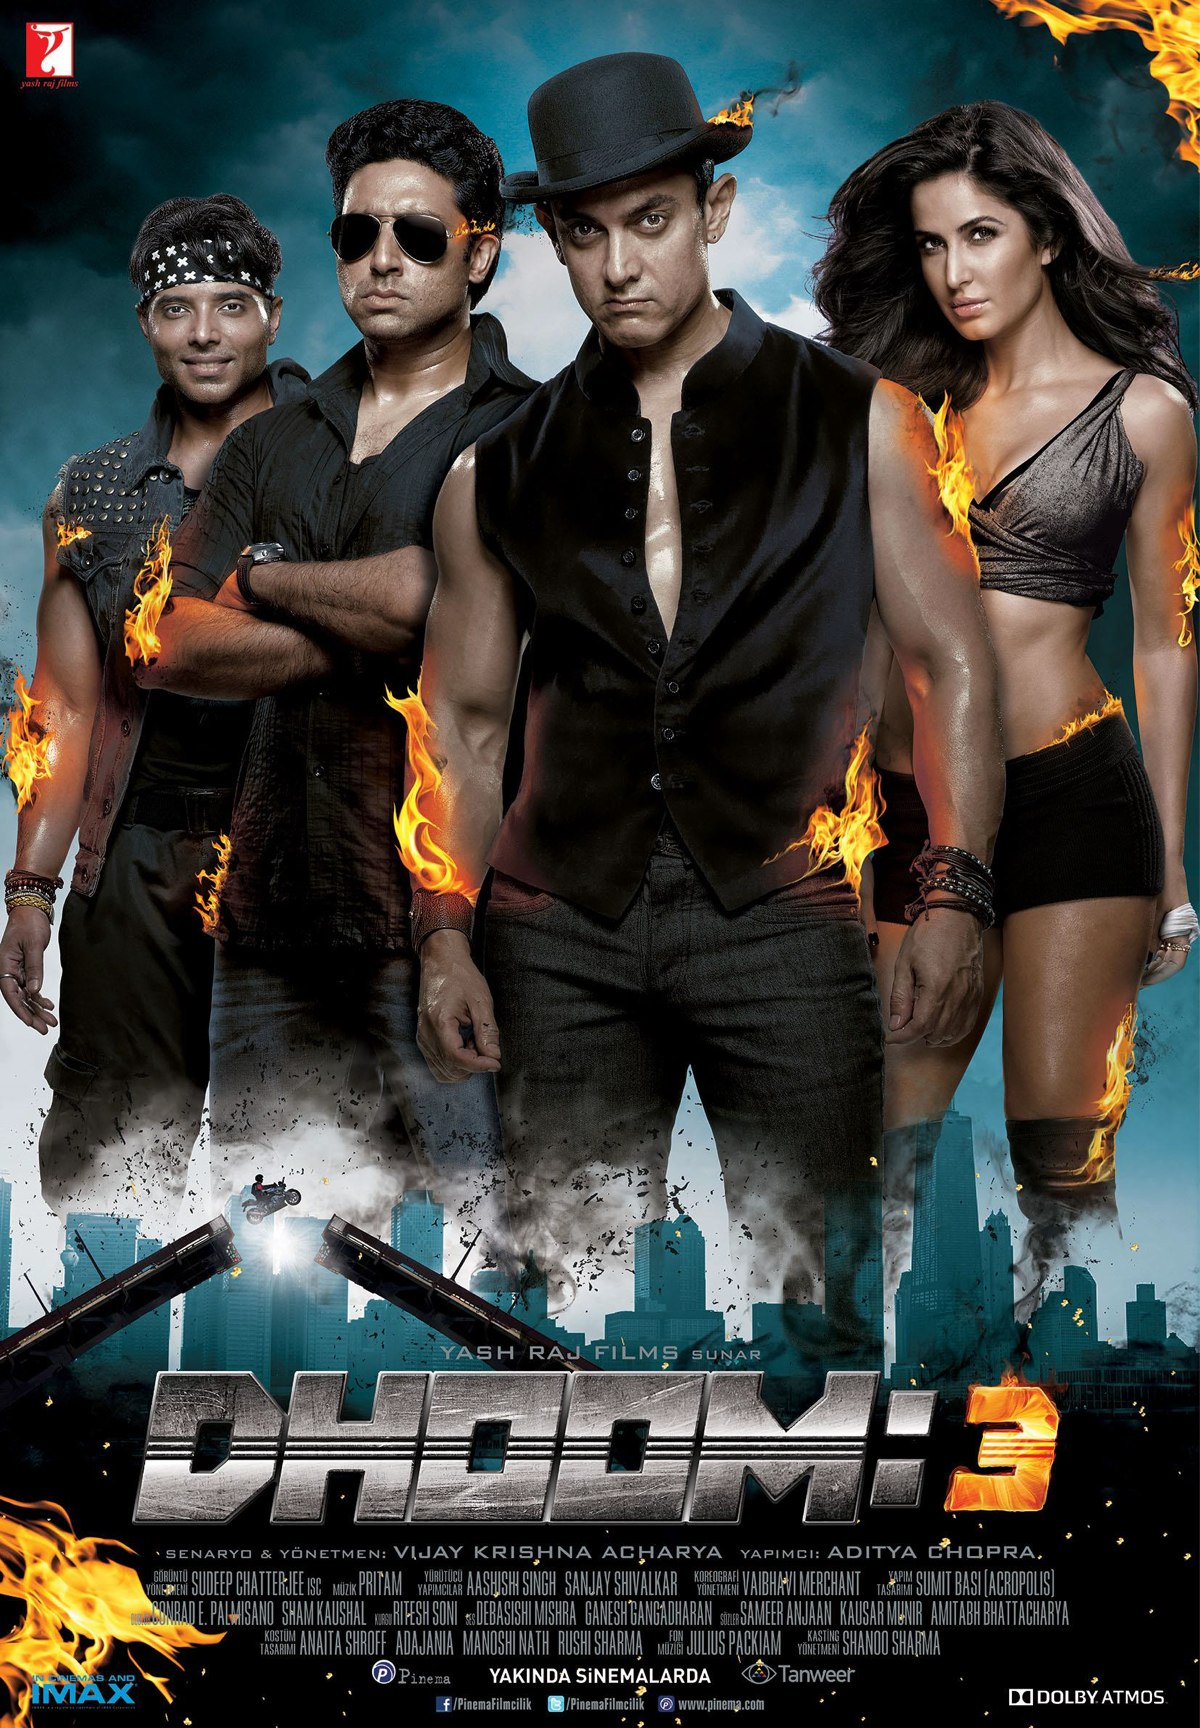 Dhoom 3 Film 2013 Beyazperdecom